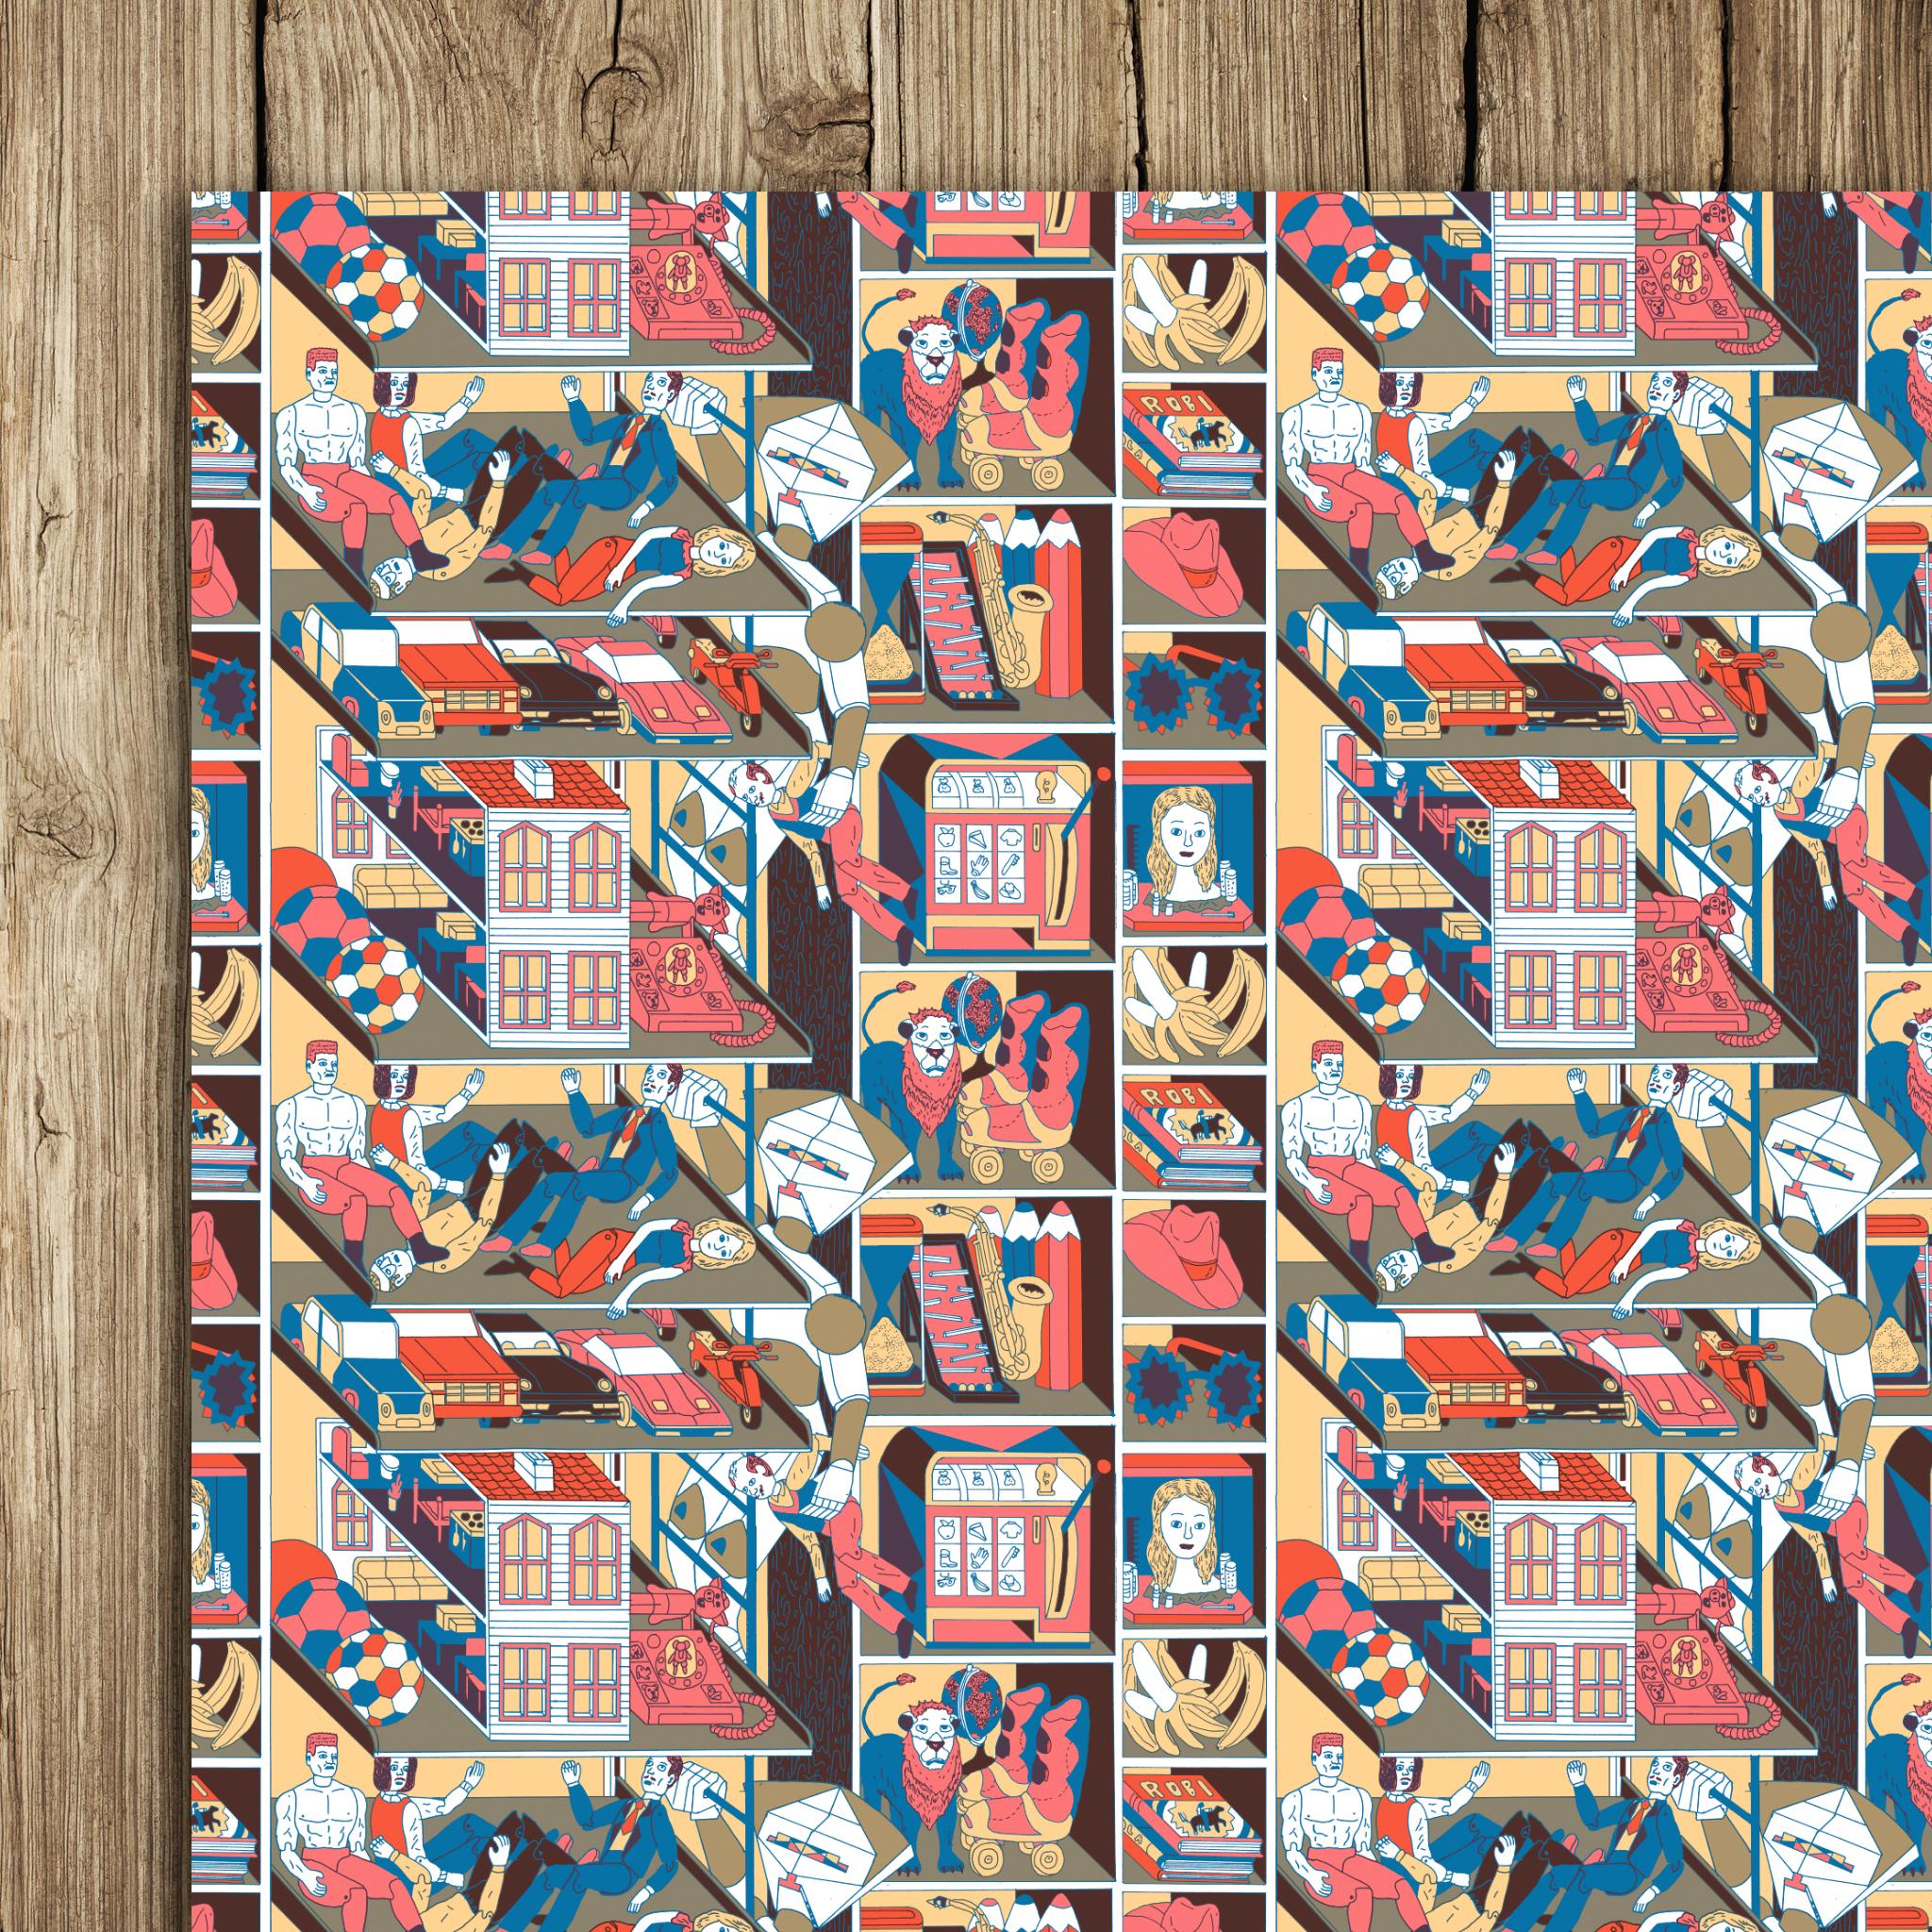 Paul Paetzel Wrap (5 sheets)